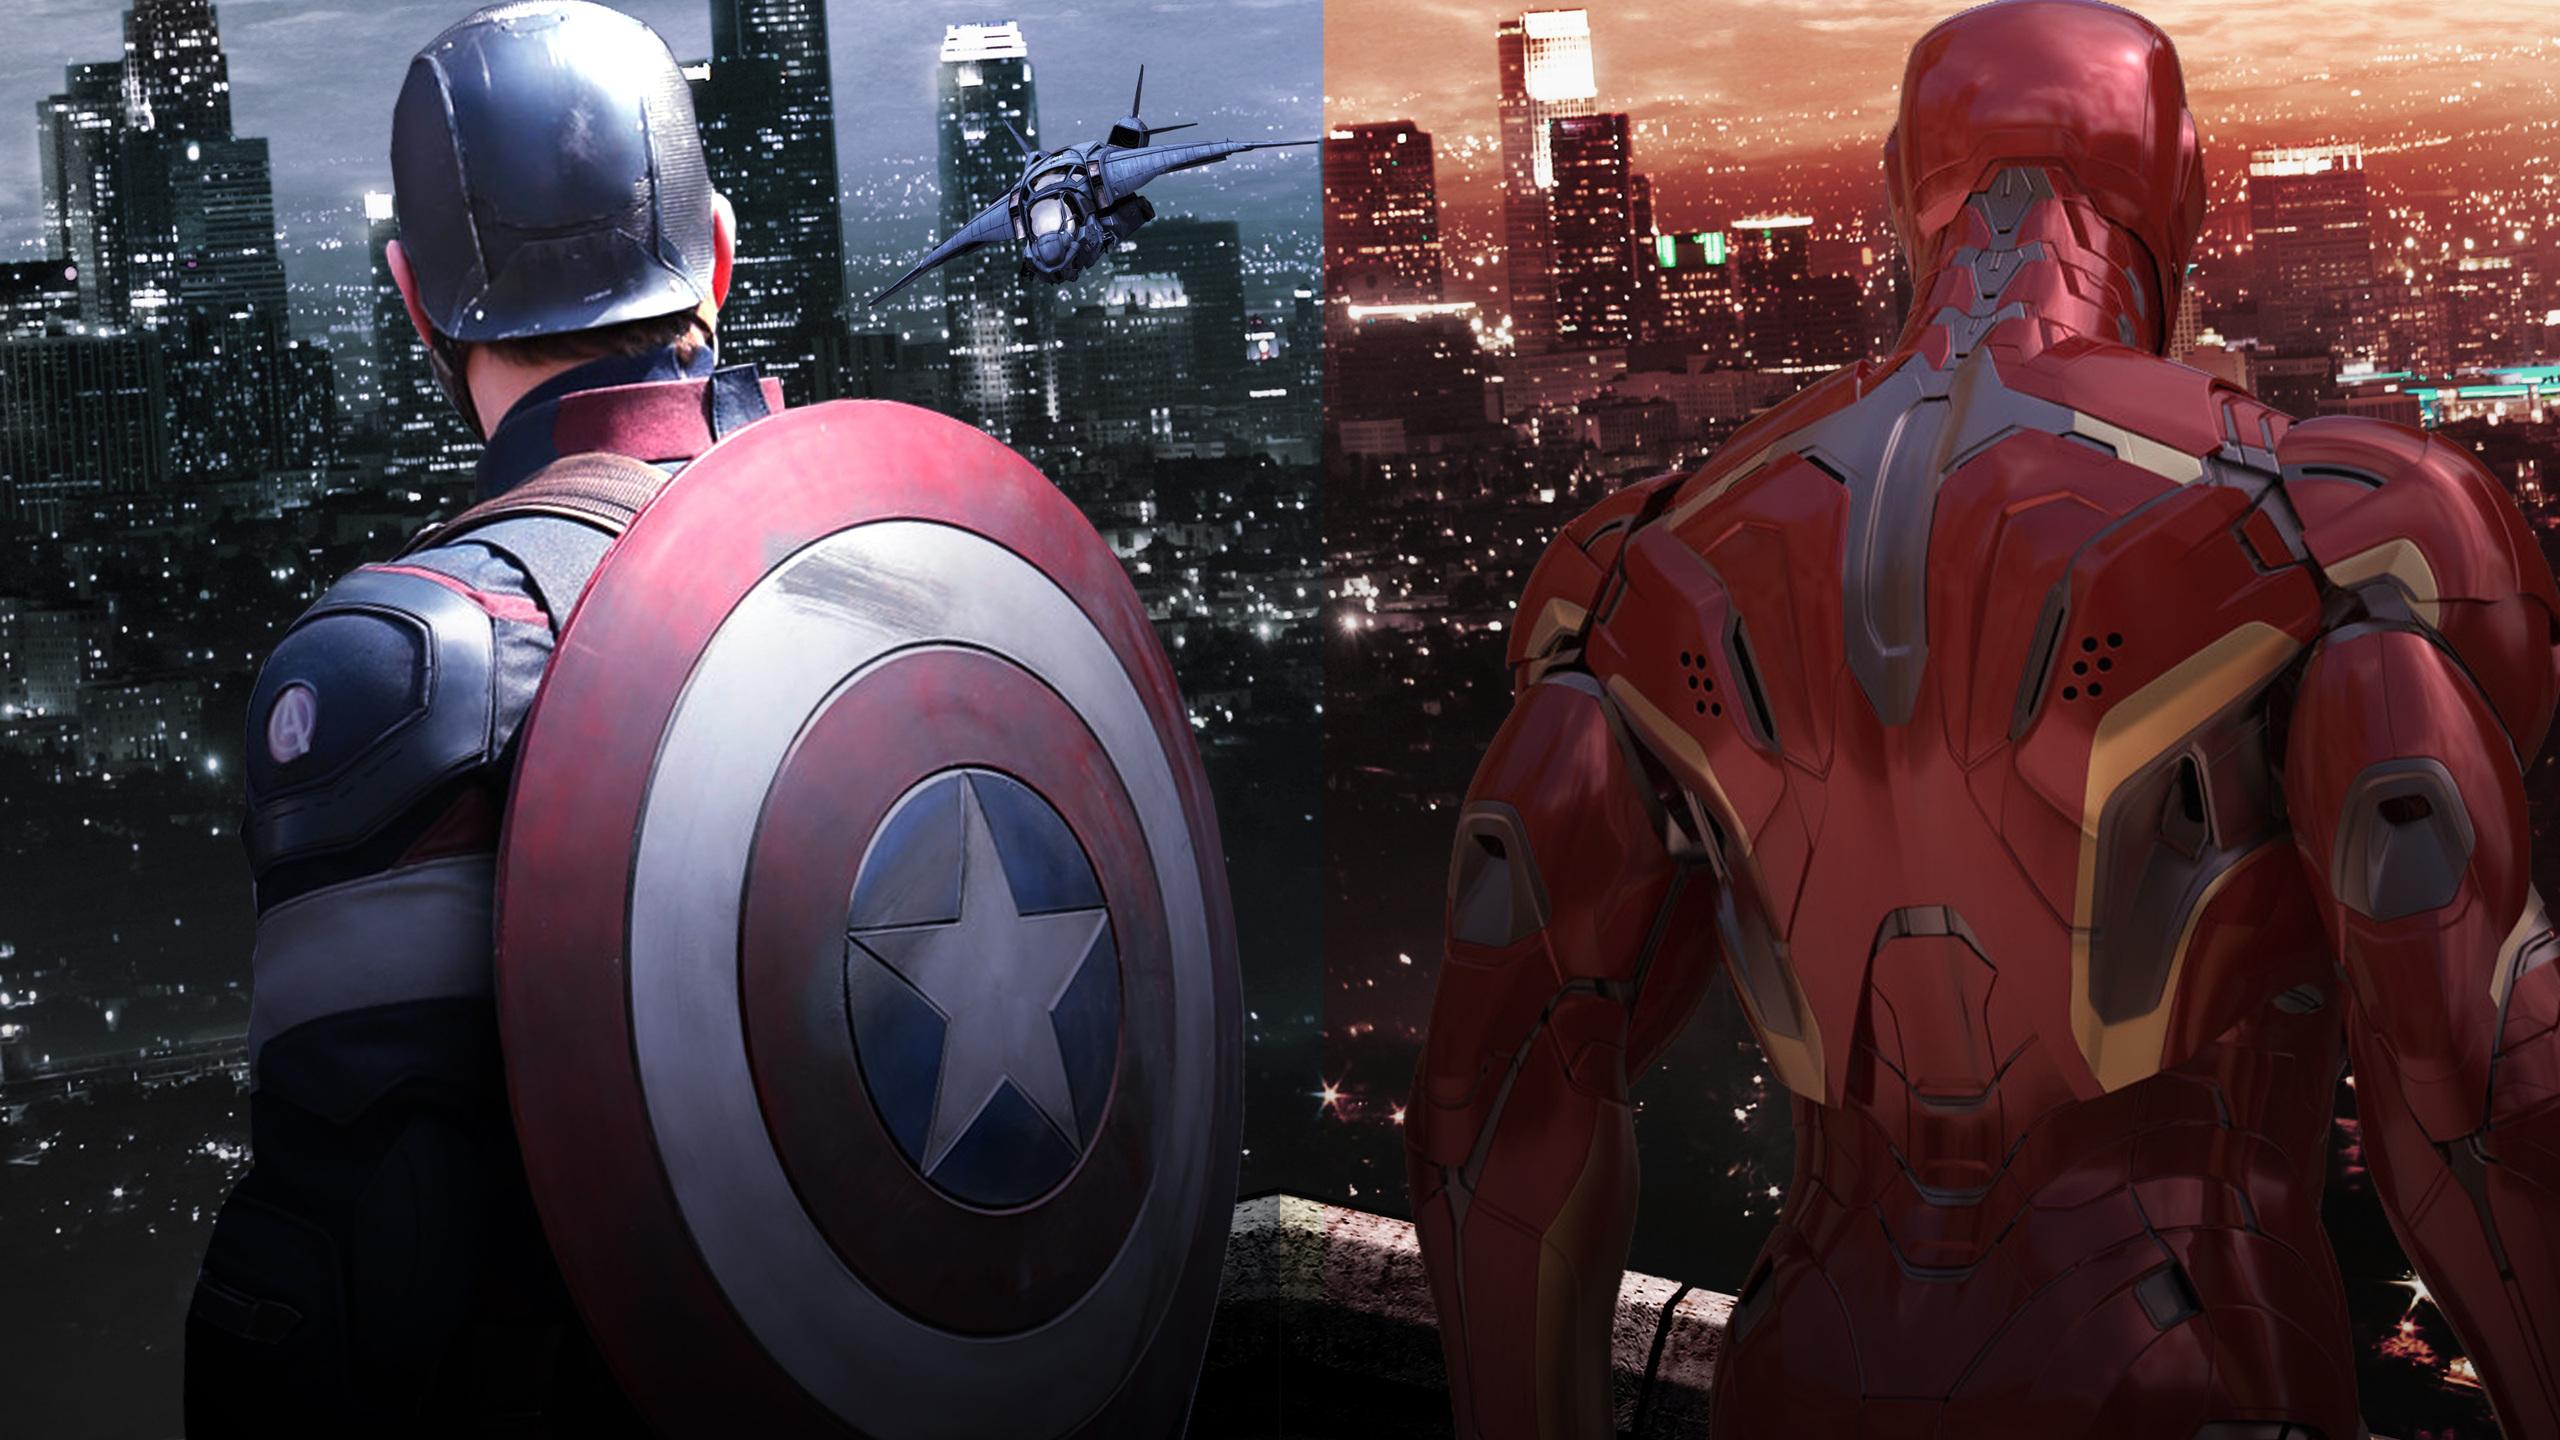 2560x1440 Captain America Shield And Iron Man 1440p Resolution Hd